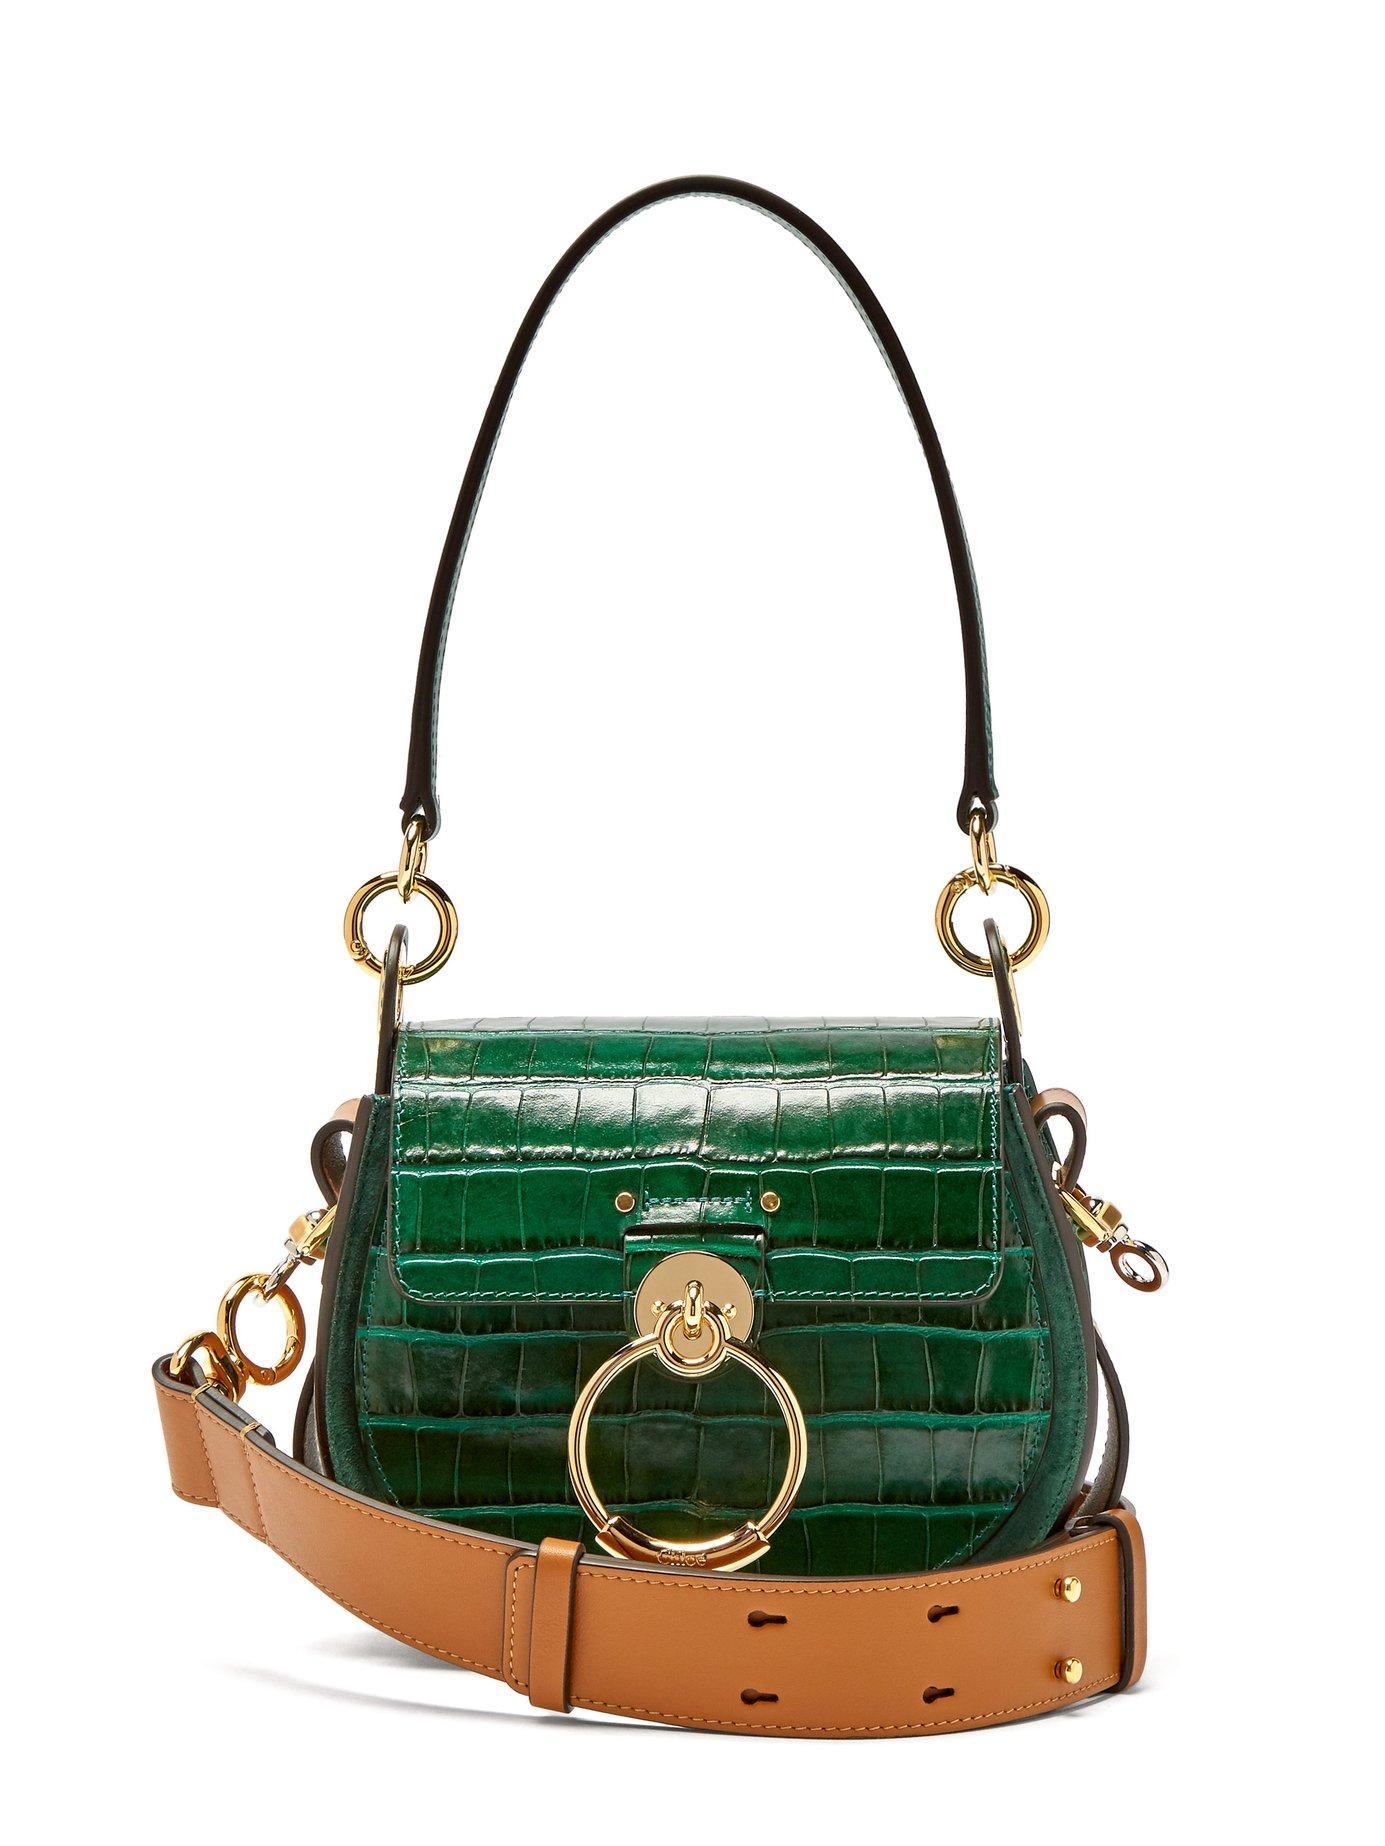 15958f4bf593 Chloé - Green Tess Small Crocodile Effect Leather Cross Body Bag - Lyst.  View fullscreen